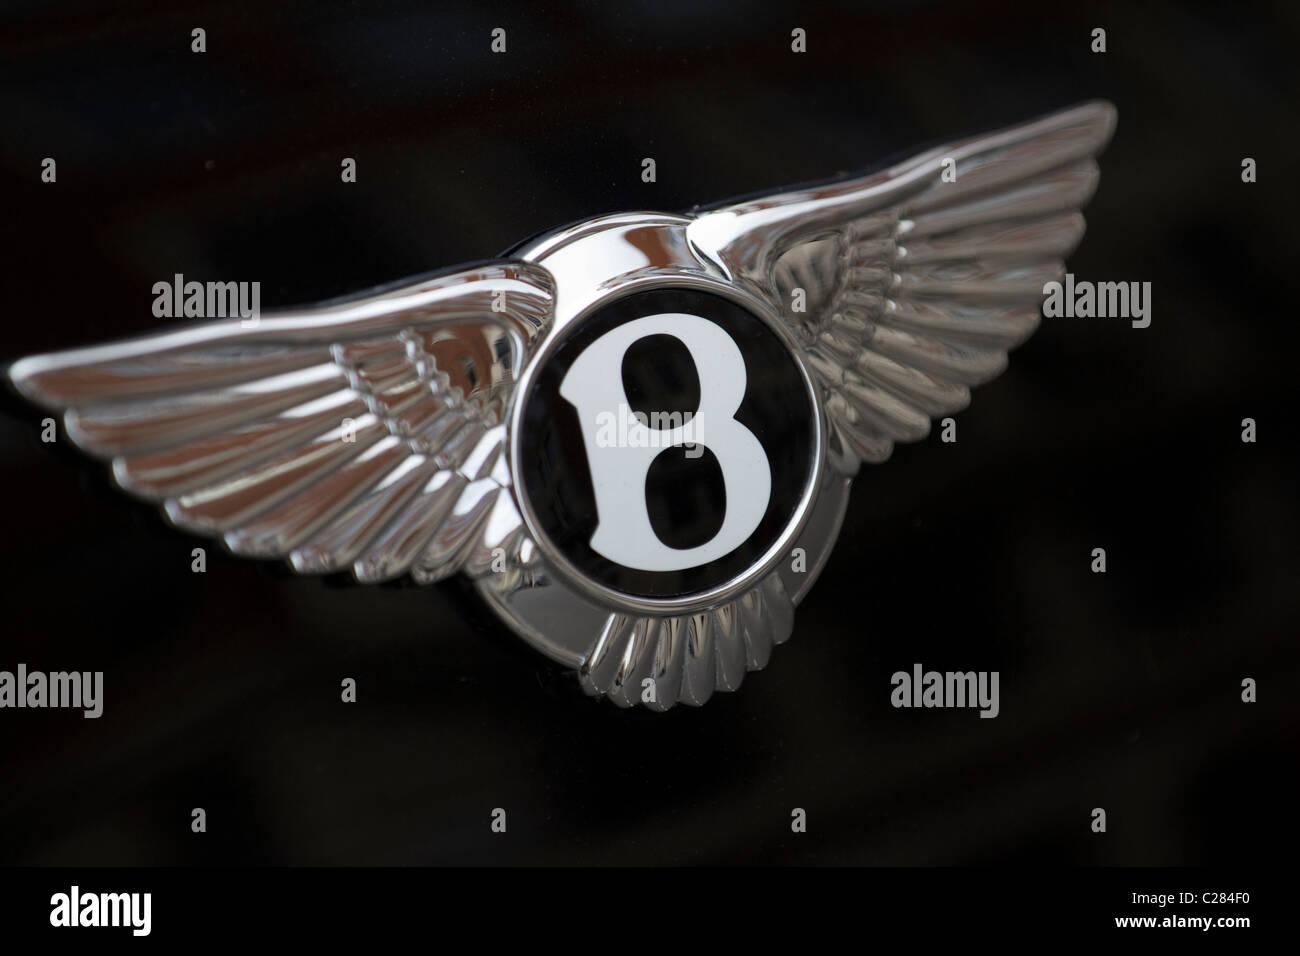 Bentley-Auto-Plakette Stockbild